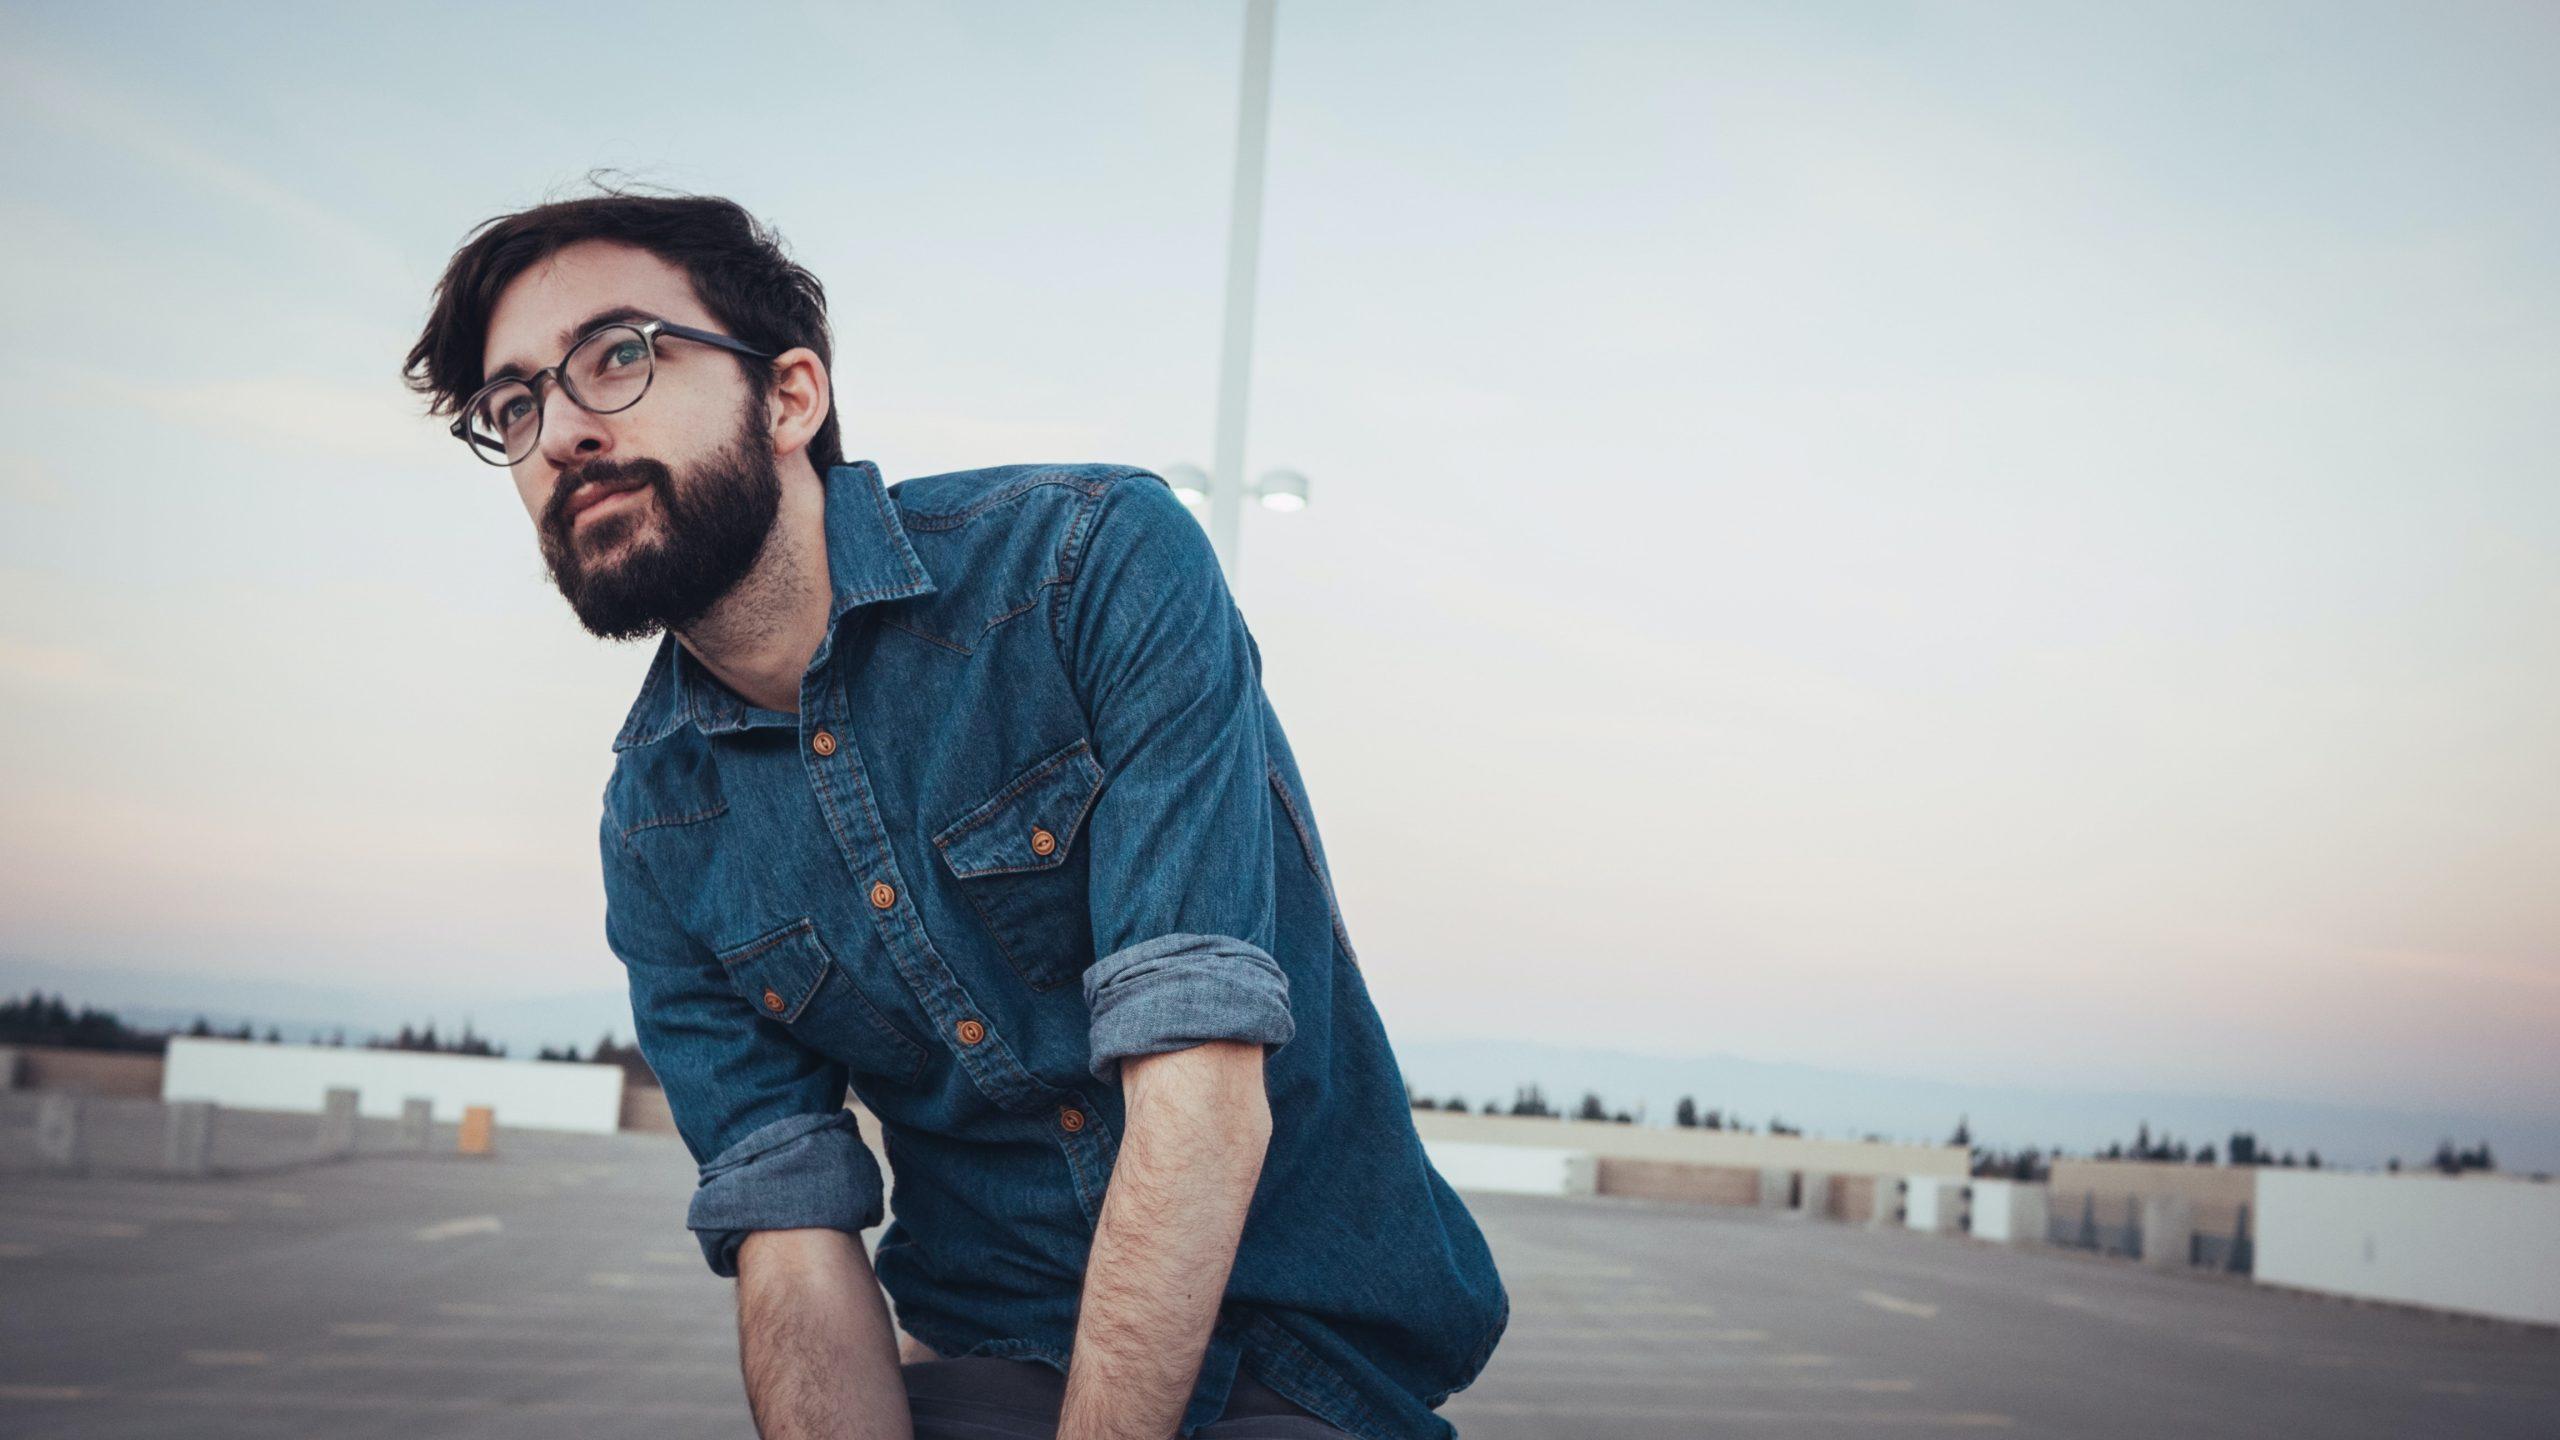 man wearing denim sport shirt and sunglasses on concrete flooring